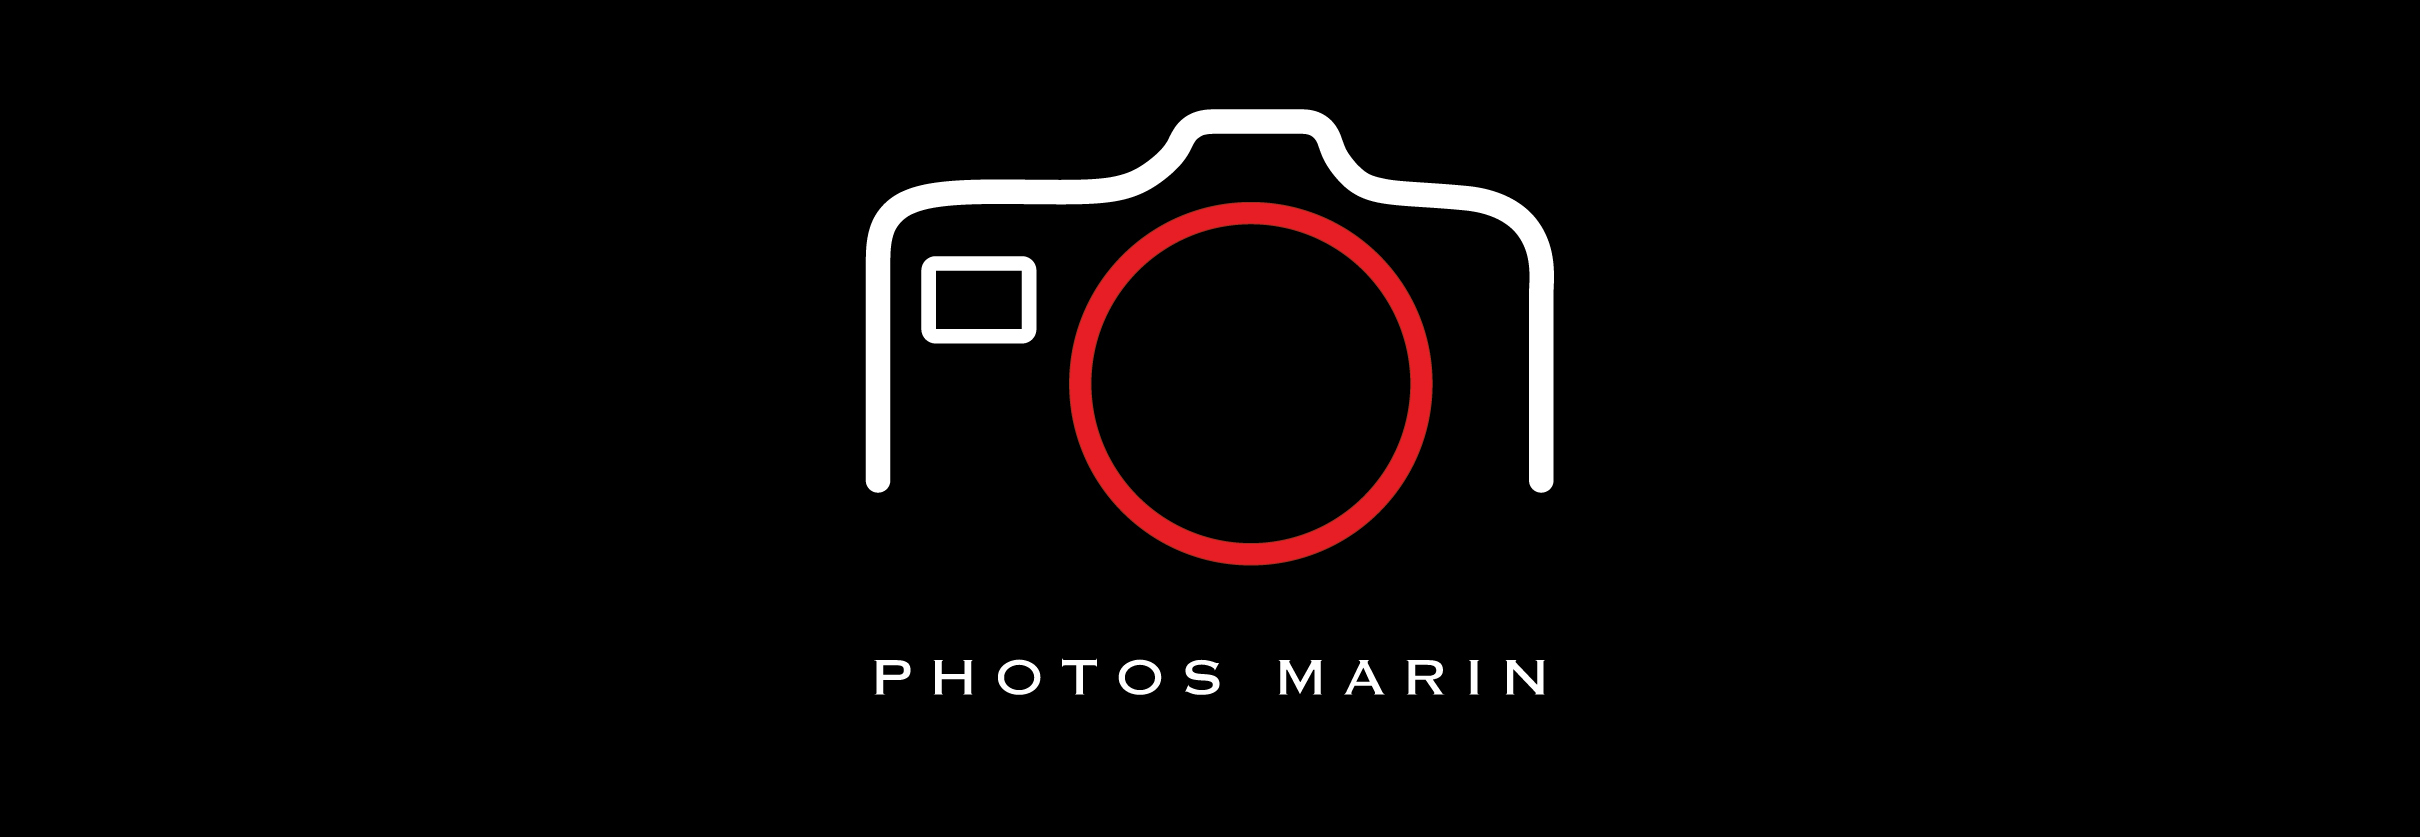 photosmarin